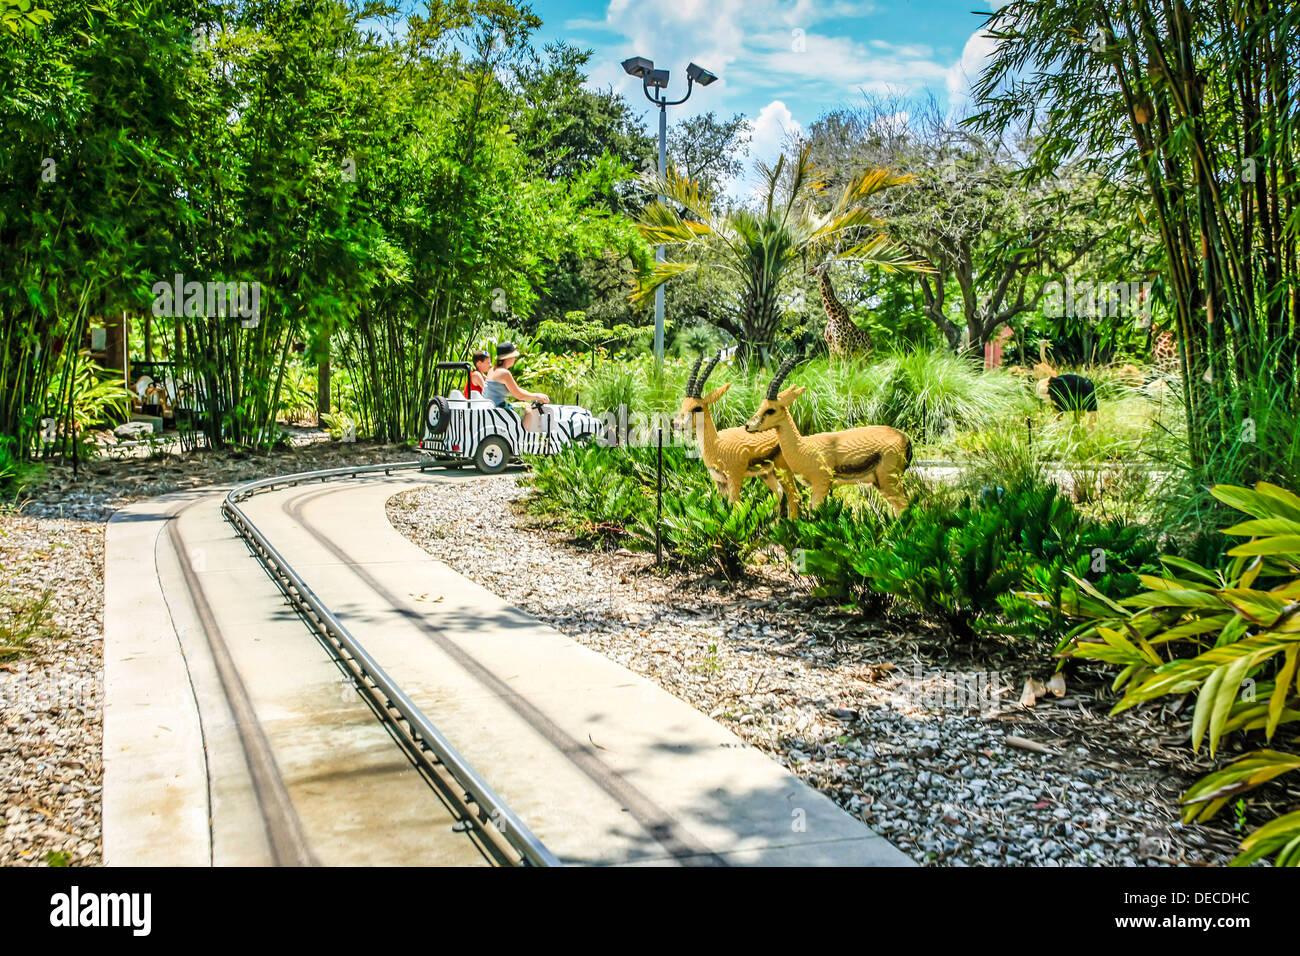 Safari In Africa At The Legoland Theme Park Florida